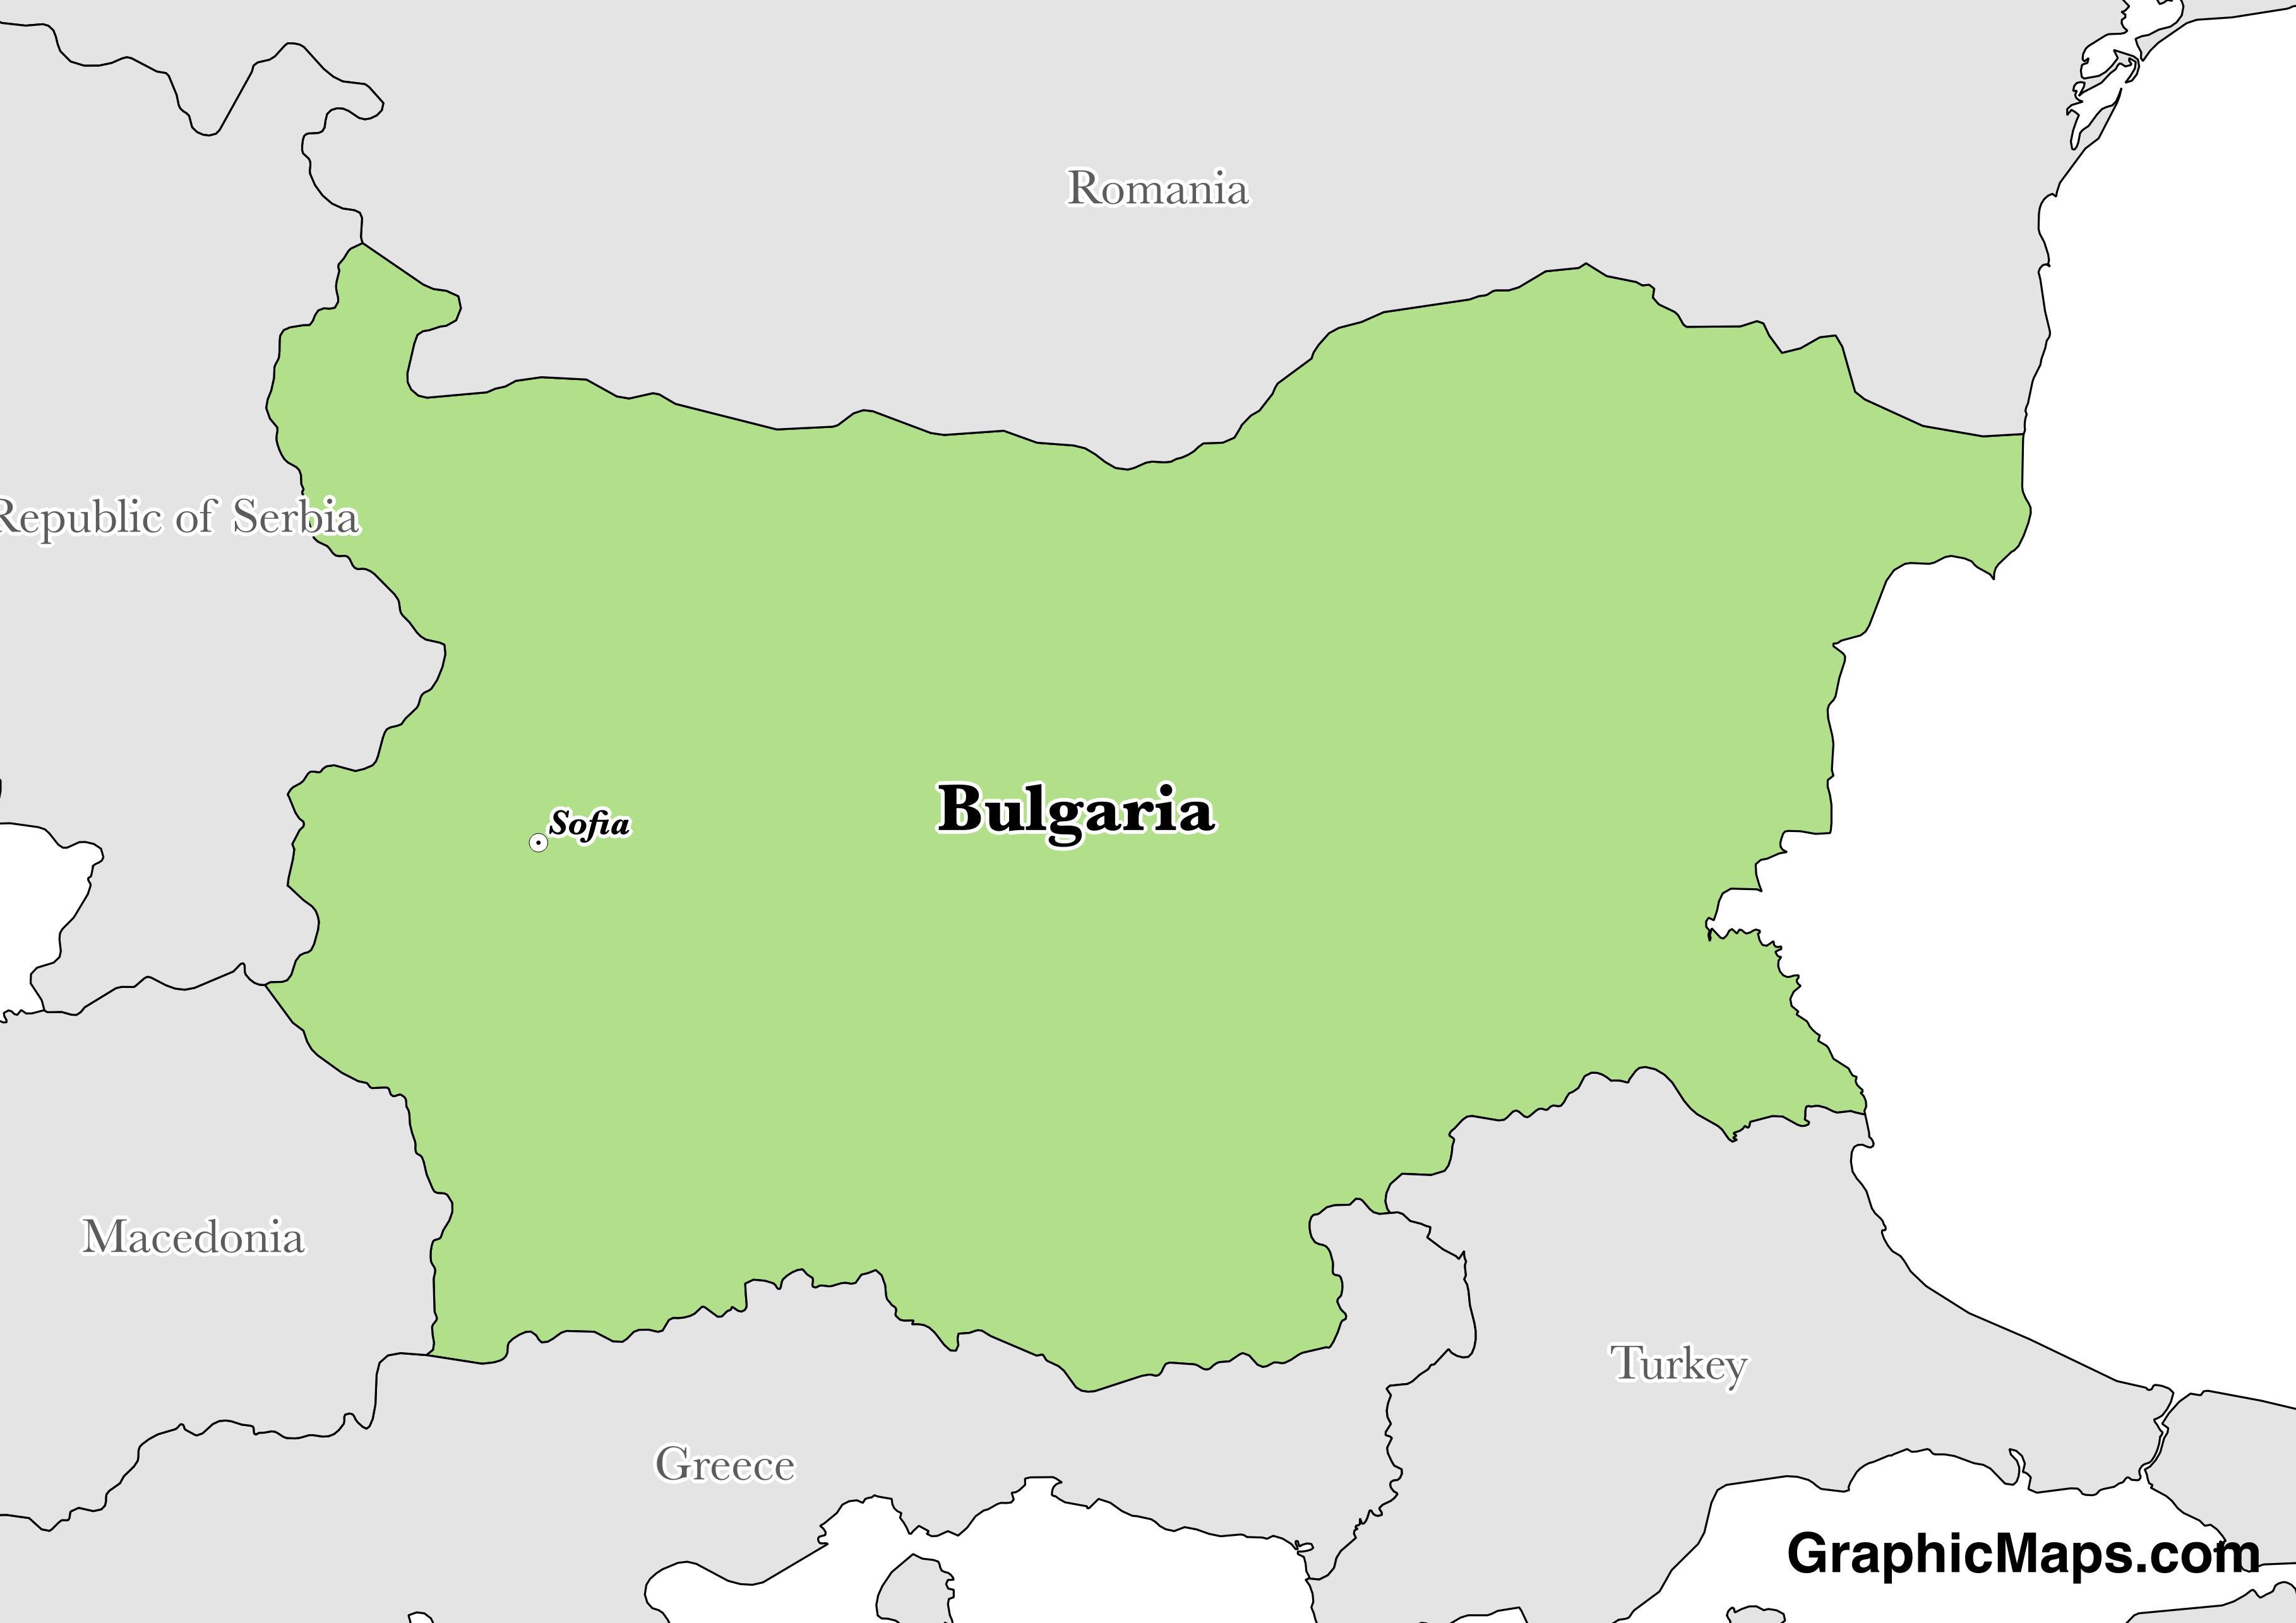 Bulgaria / GraphicMaps.com